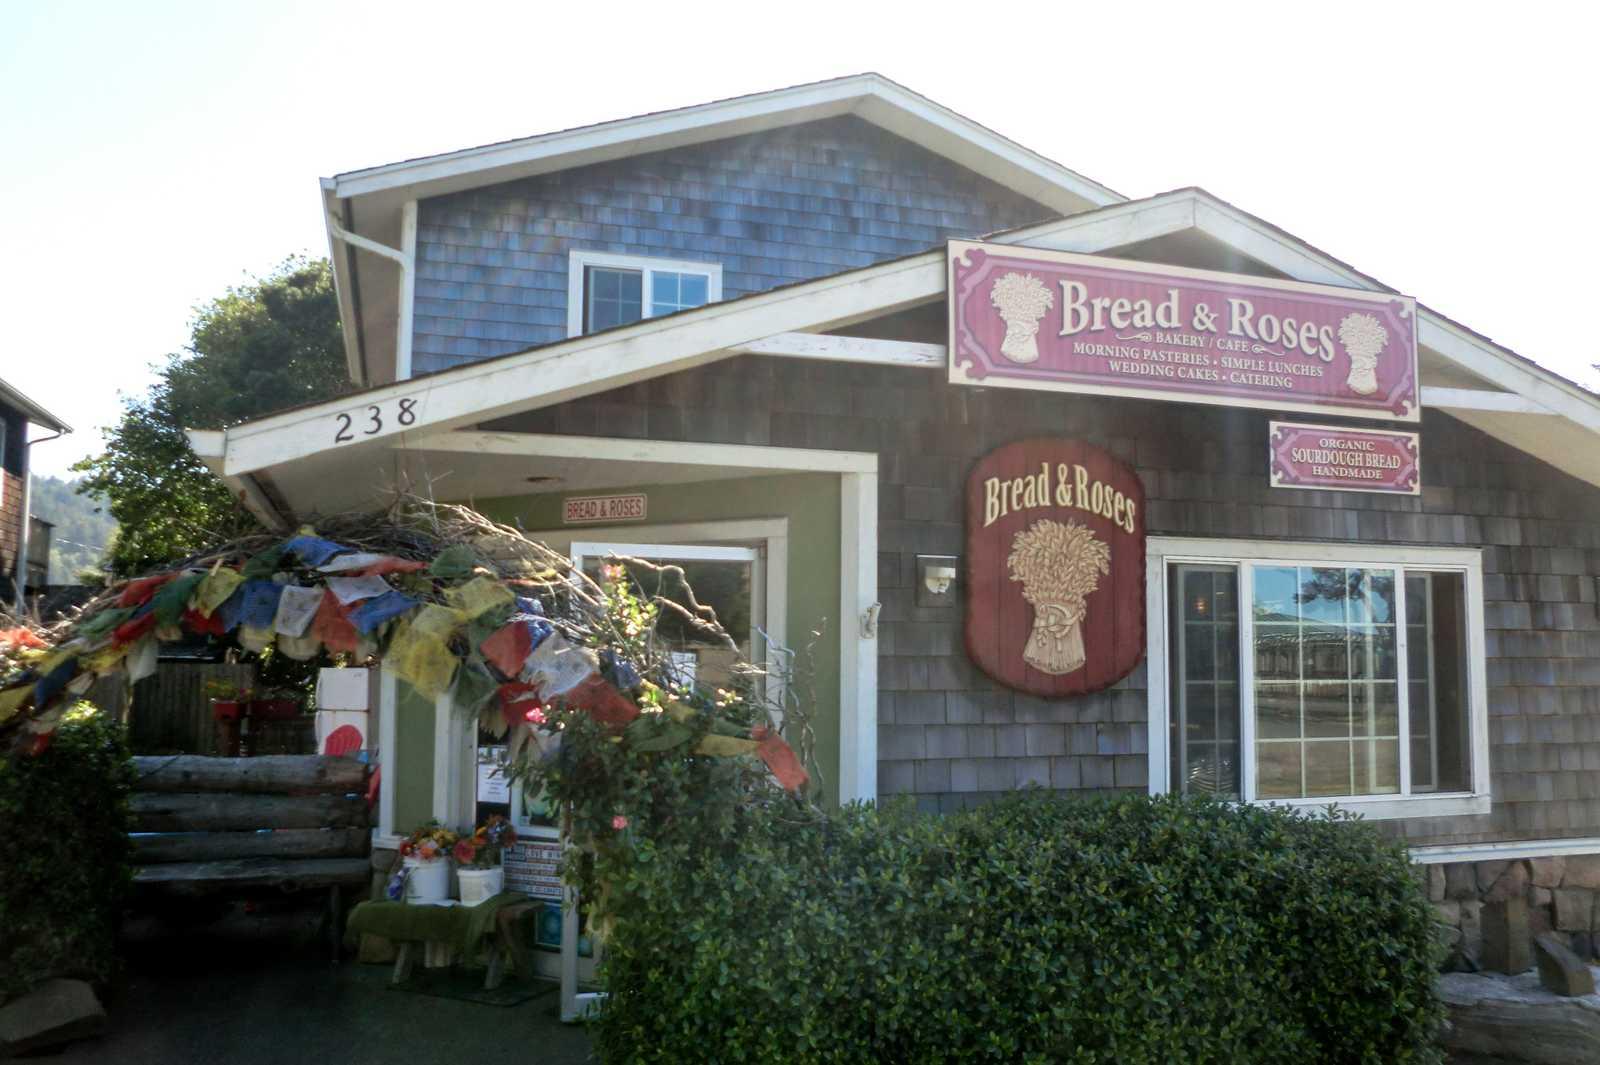 Die Bread & Roses Bäckerei in Yachats, Oregon